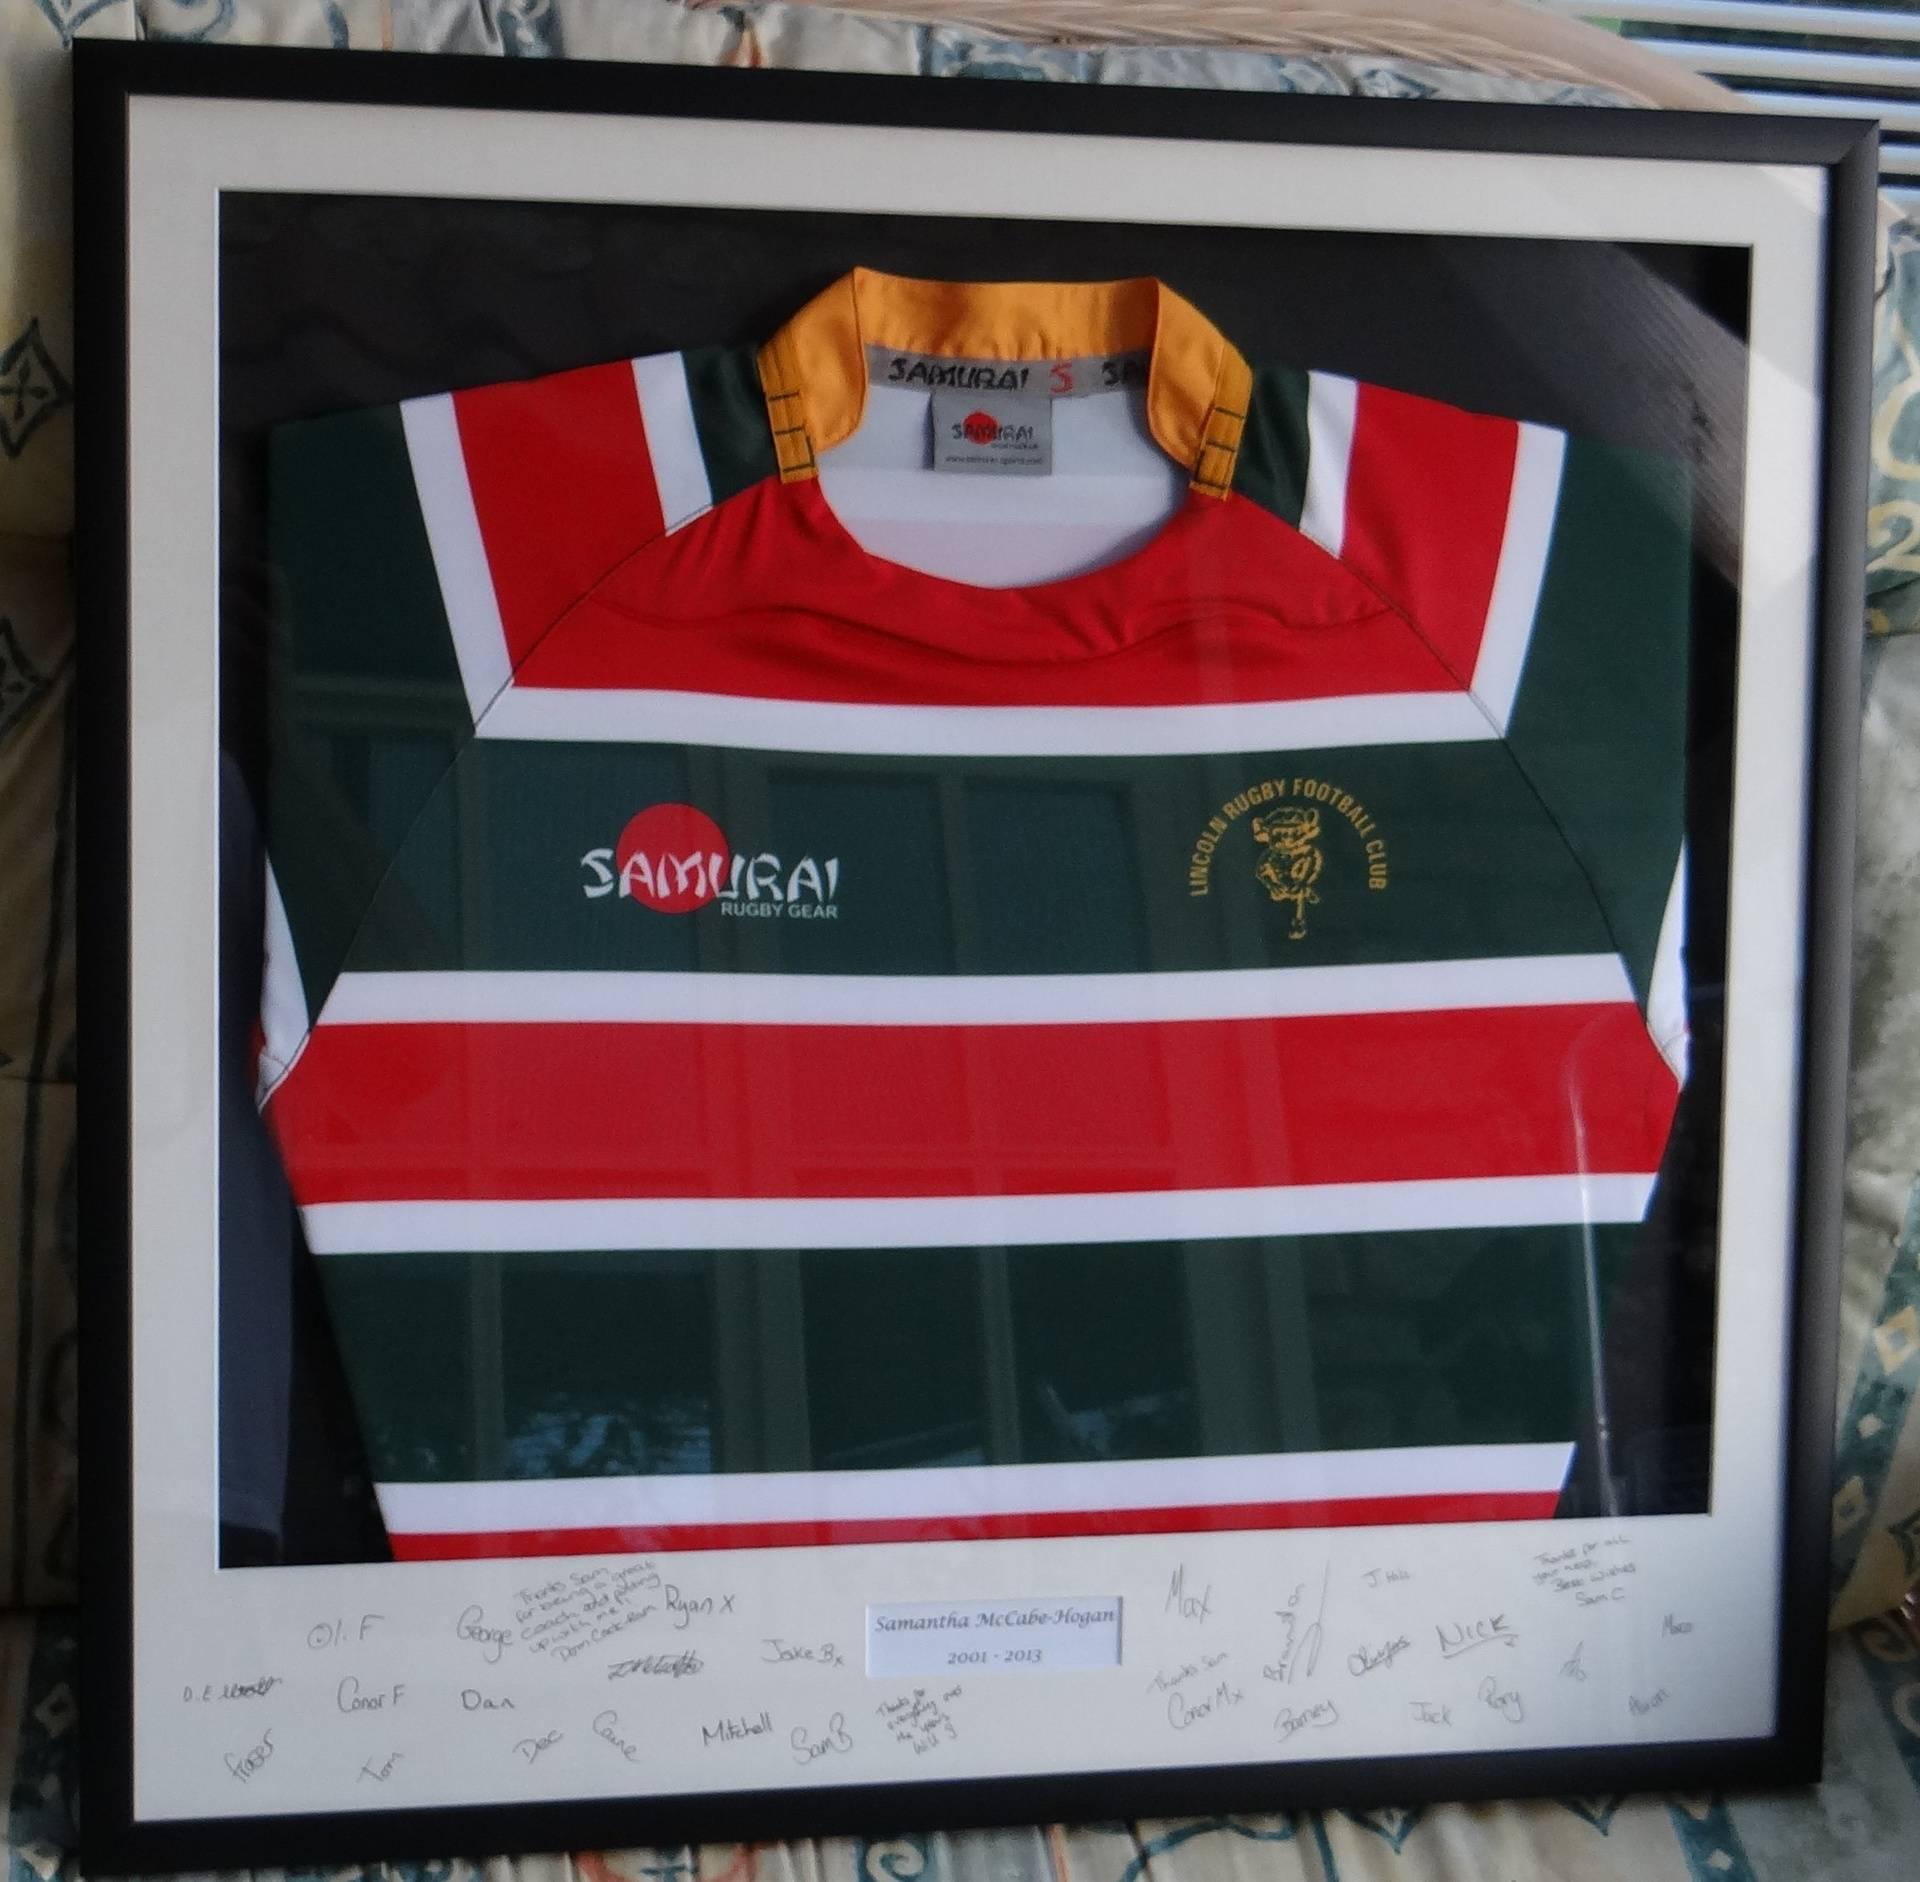 Lincoln Rugby Football Club shirt